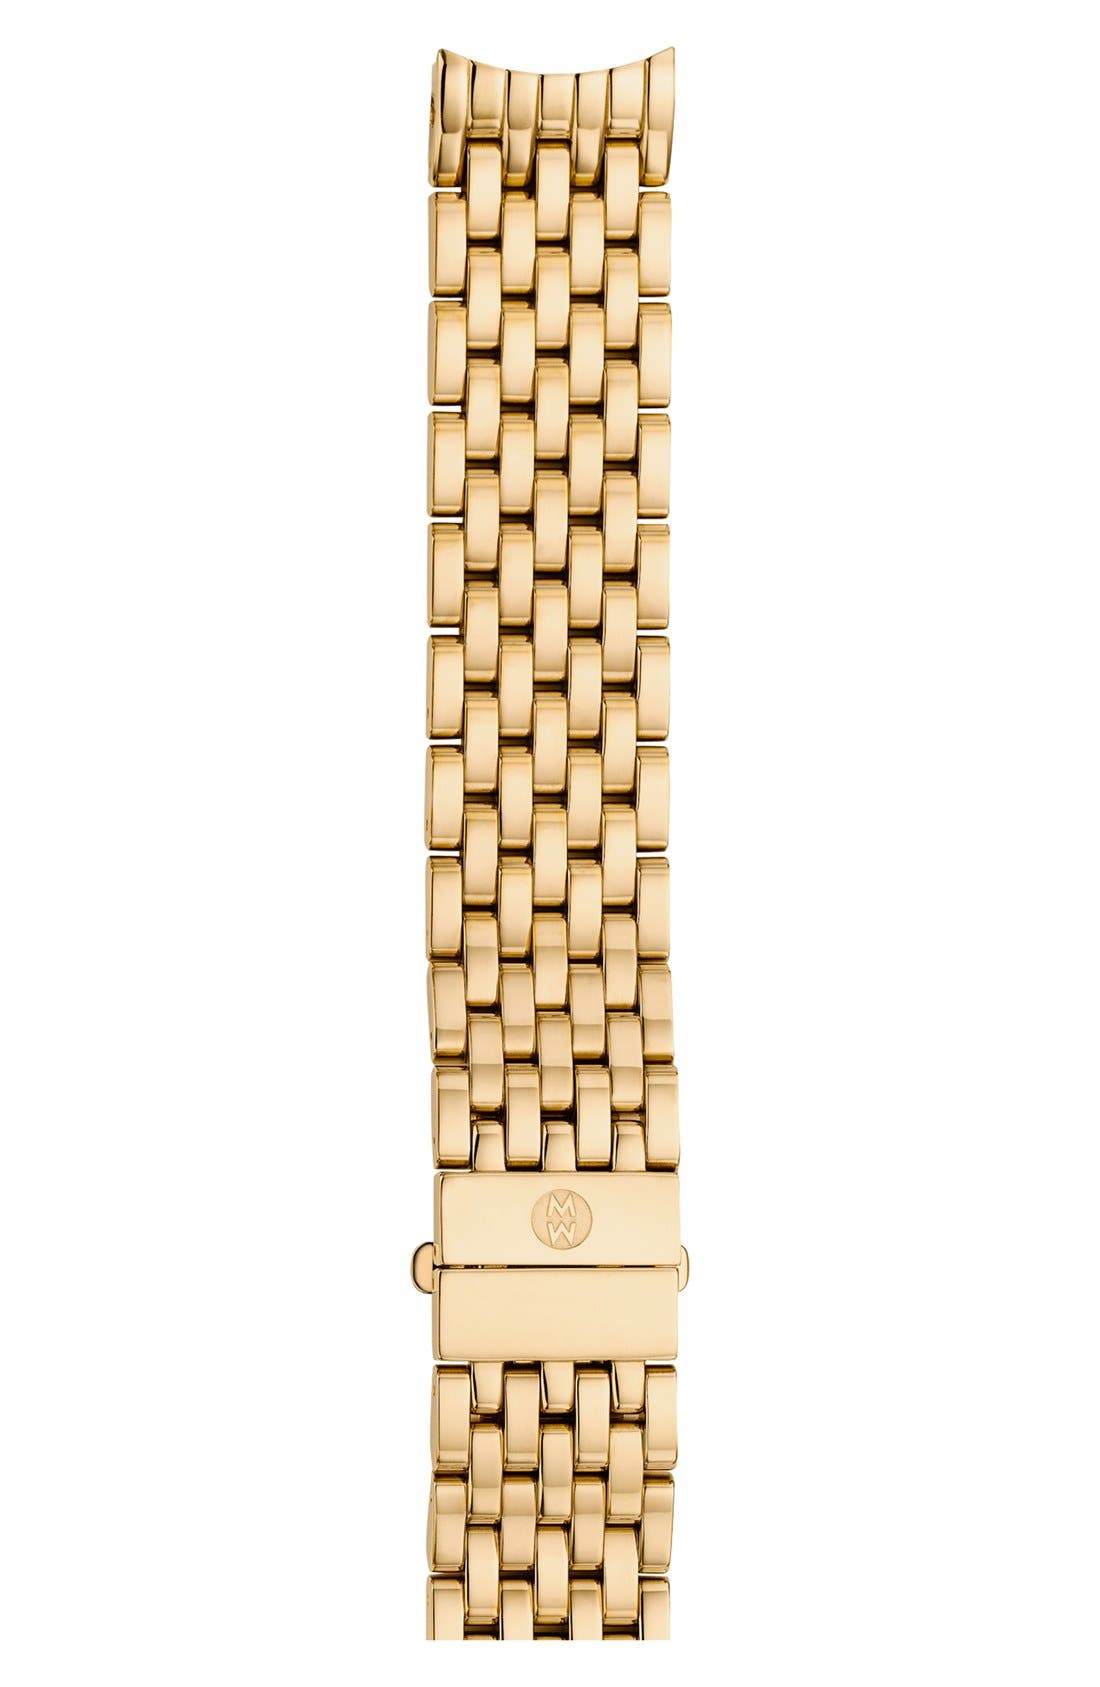 Serein 16mm Gold Plated Bracelet Watchband,                         Main,                         color, GOLD